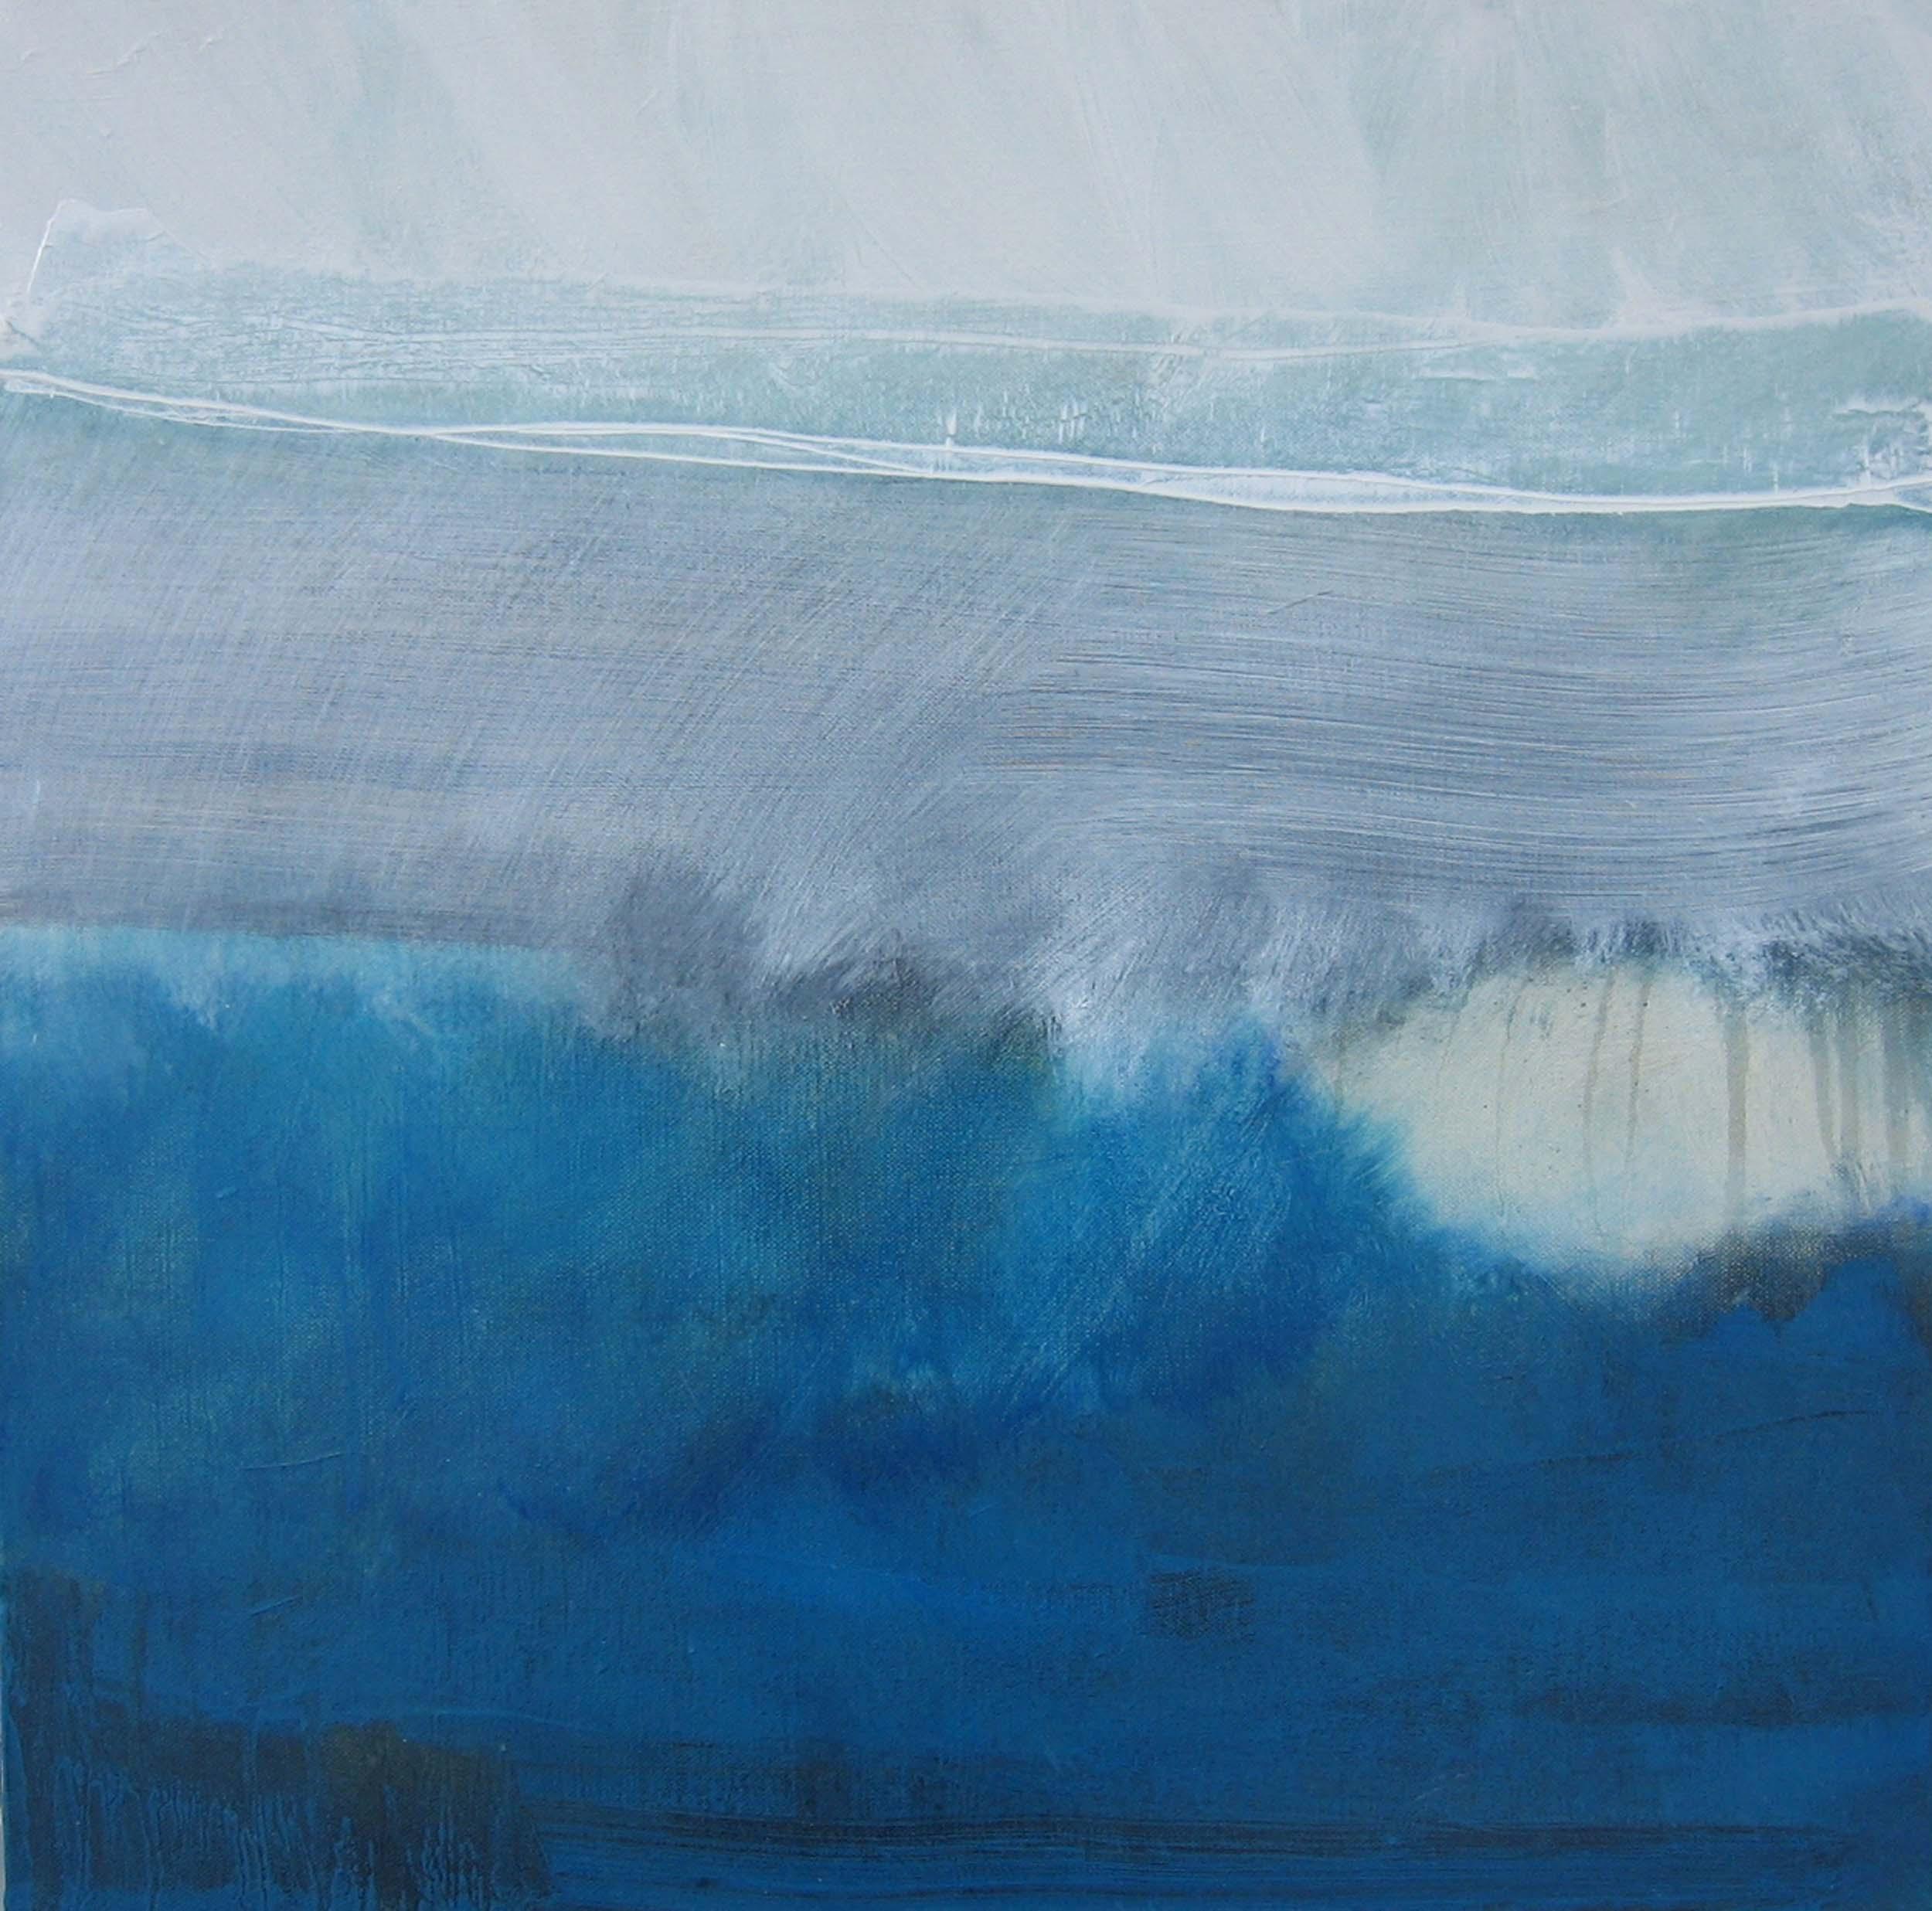 Leah Beggs 2009 - Waters Edge  - Oil on Canvas - 60 x 60cm_sml.jpg